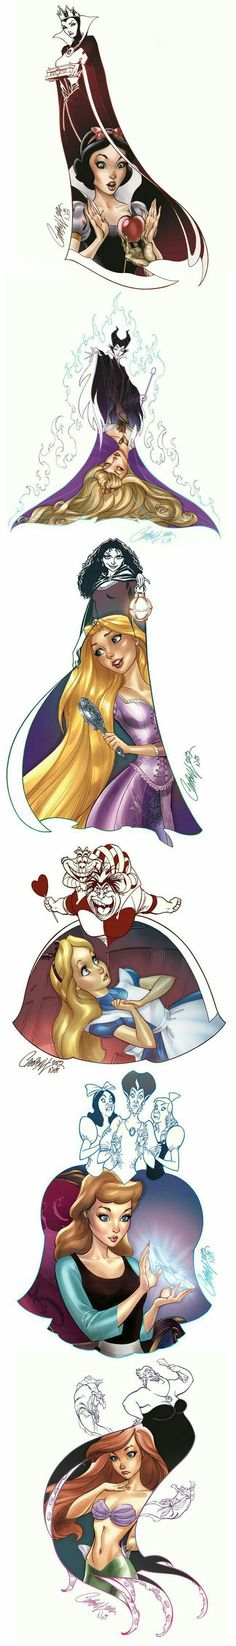 "Evil"": The Series Beautifully Mixes Disney Heroines with Their Villains Artist J. Scott Campbell has once again created some incredible Disney Art. Disney Pixar, Disney And Dreamworks, Disney Magic, Disney Art, Disney Movies, Disney Characters, Disney Stuff, Twisted Disney Princesses, Disney Villains Art"